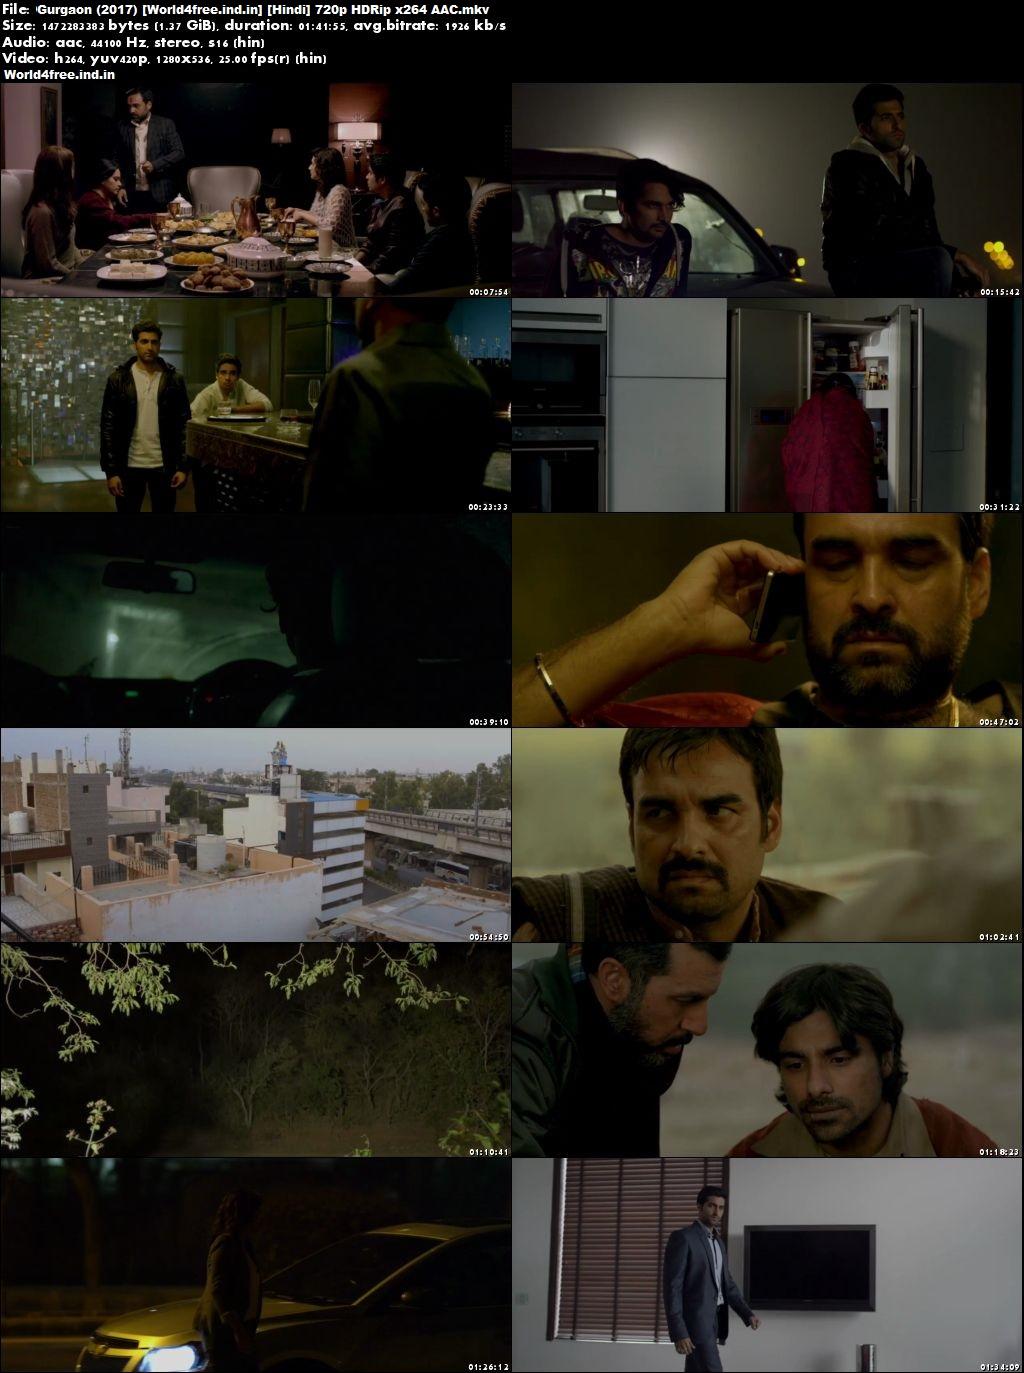 Gurgaon 2017 worldfree4u Full HDRip 1080p Hindi Movie Download